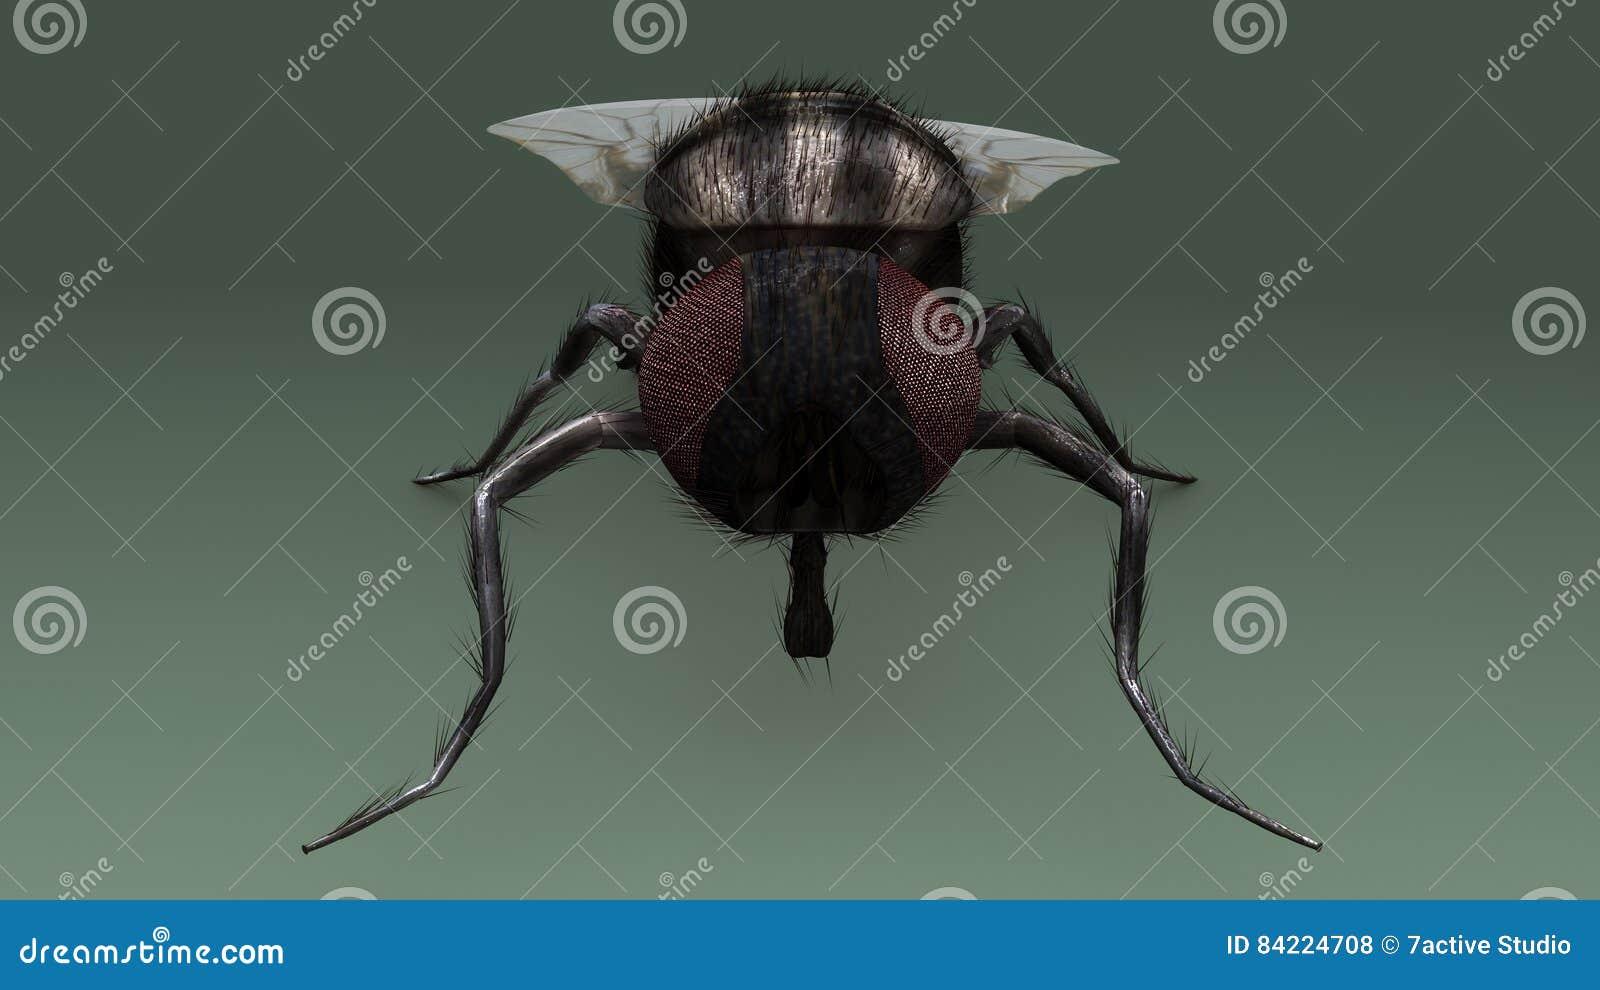 Housefly stock illustration. Illustration of black, hairy - 84224708